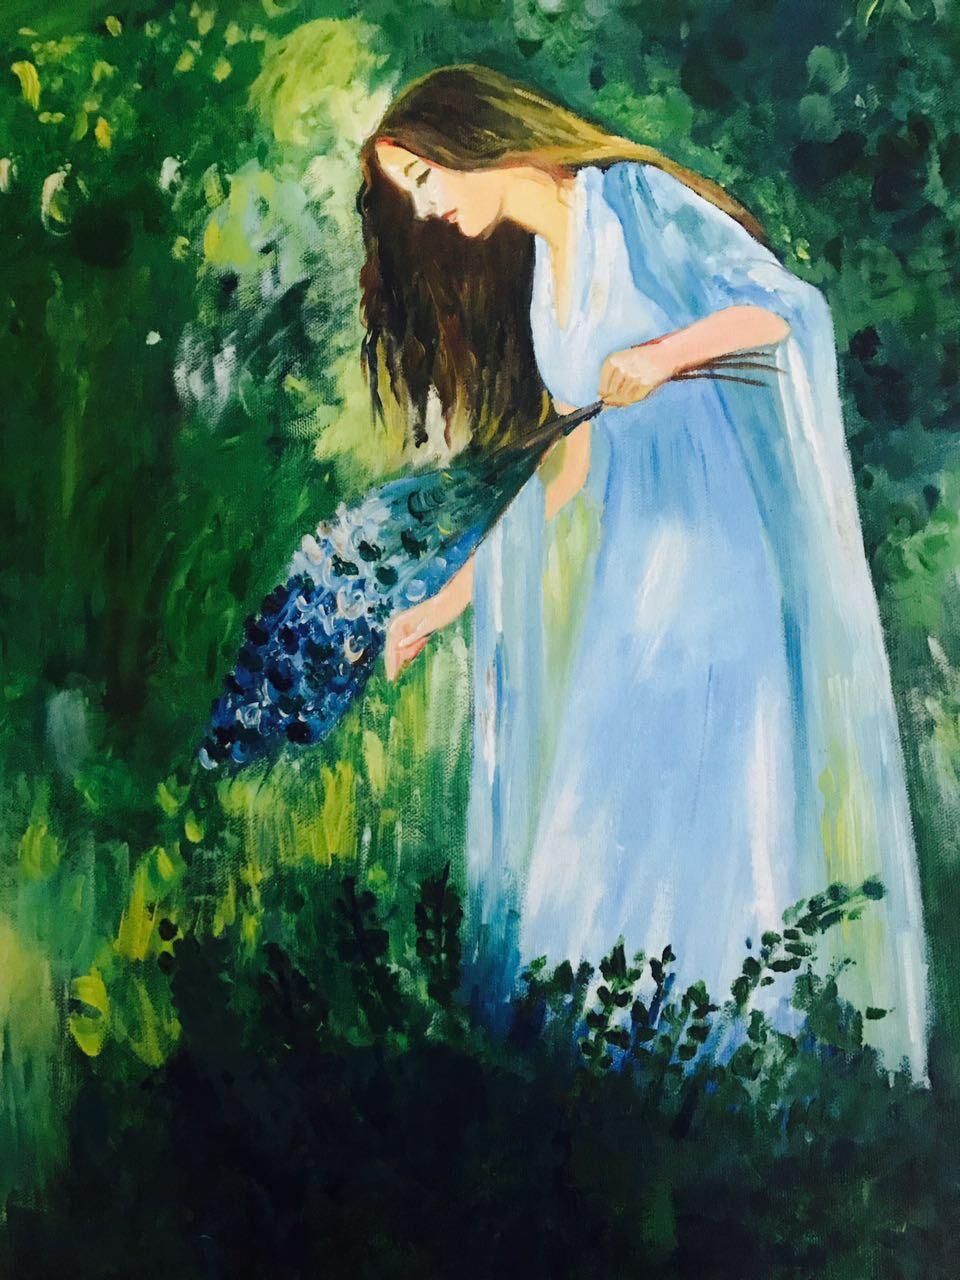 lady in a garden oil painting figure, portrait, art, garden, green, handmade, lady, oil on canvas